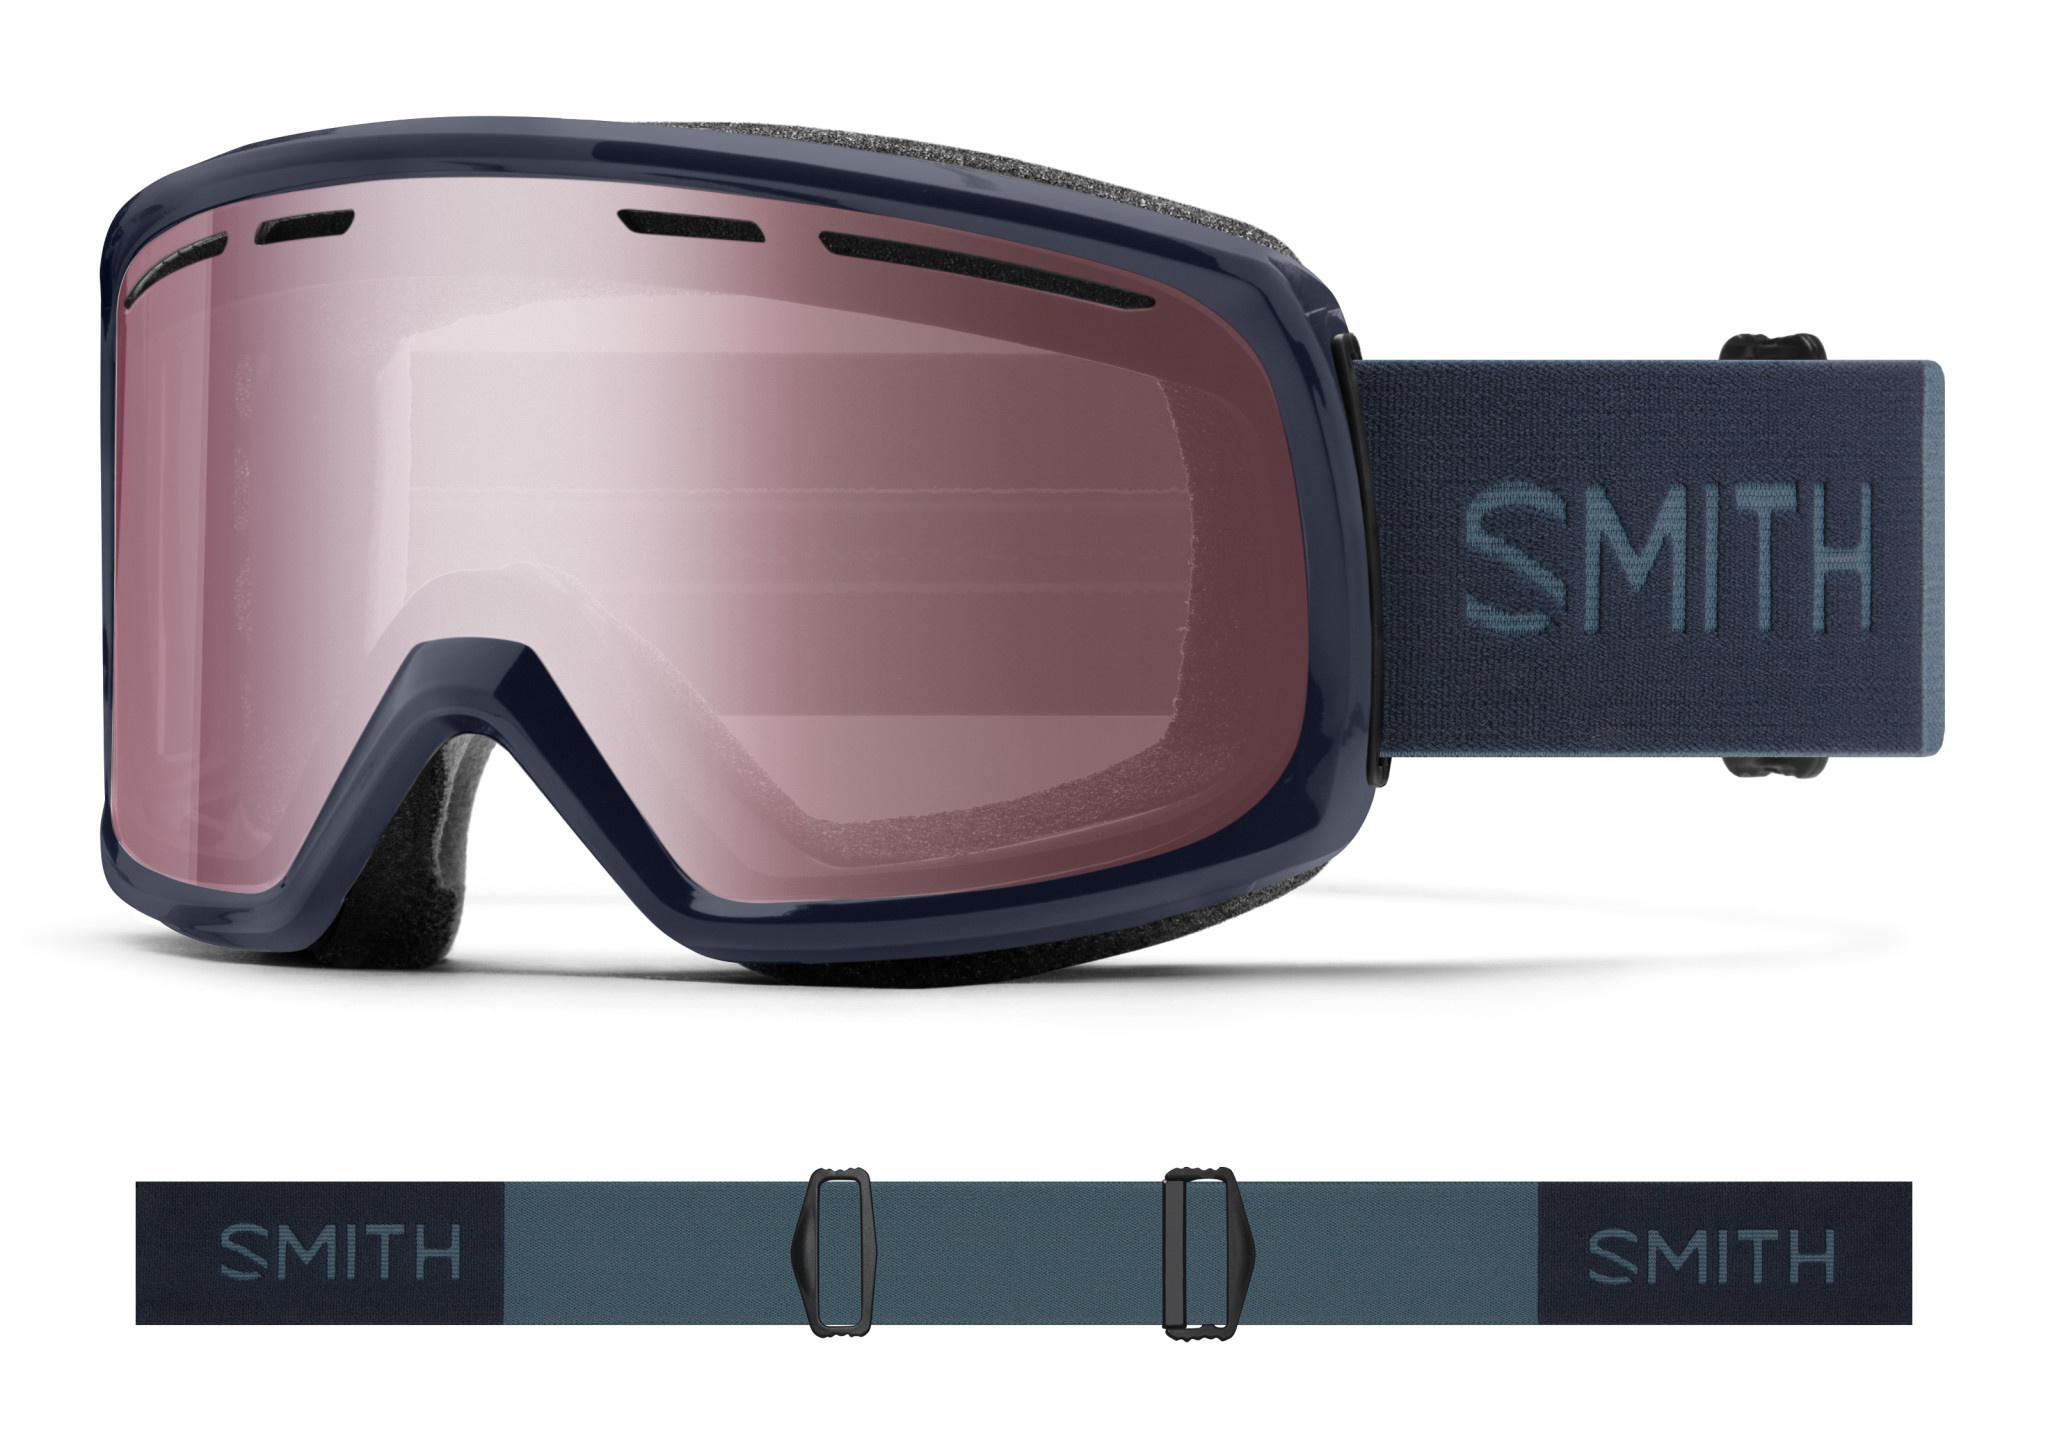 Smith Smith Range Alpine Goggles With Fog-X Anti-Fog Inner Lens